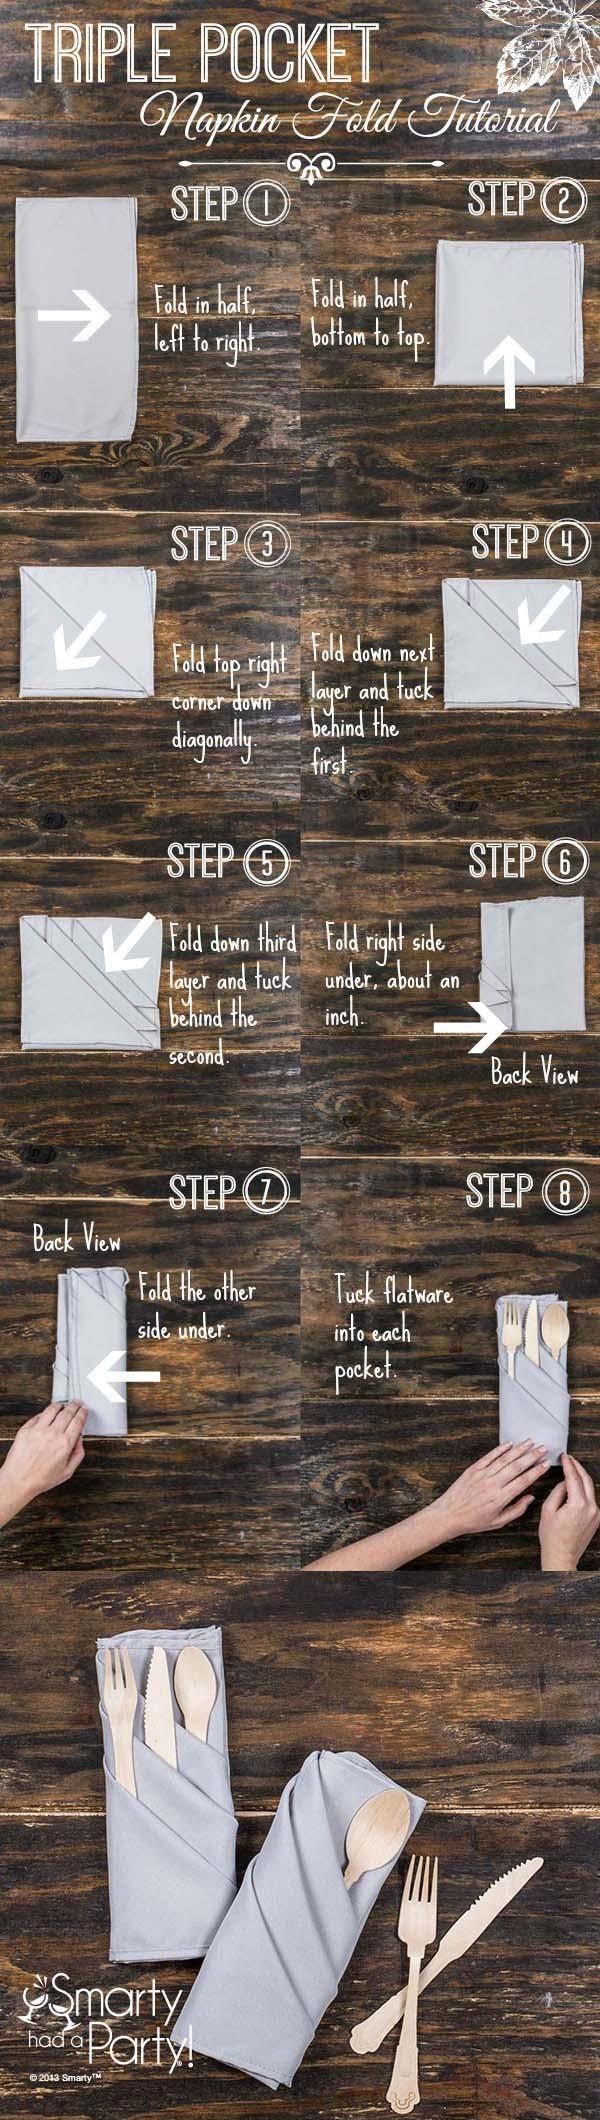 Easy, yet elegant triple pocket napkin folding tutorial.